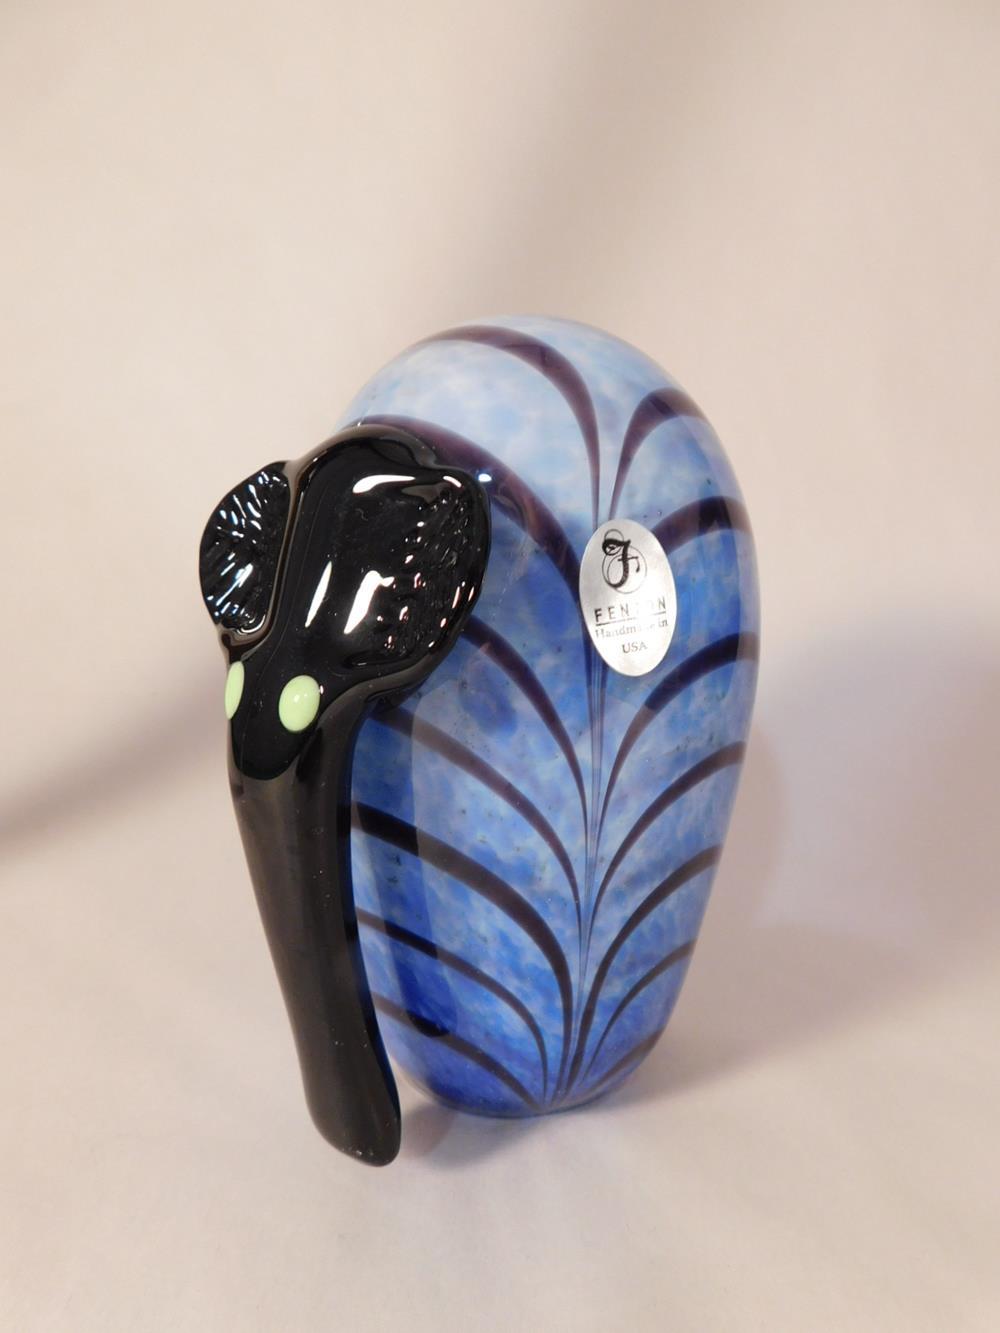 Fenton Art Glass USA Hand Painted and Signed DAVID FETTY ELEPHANT See Photo